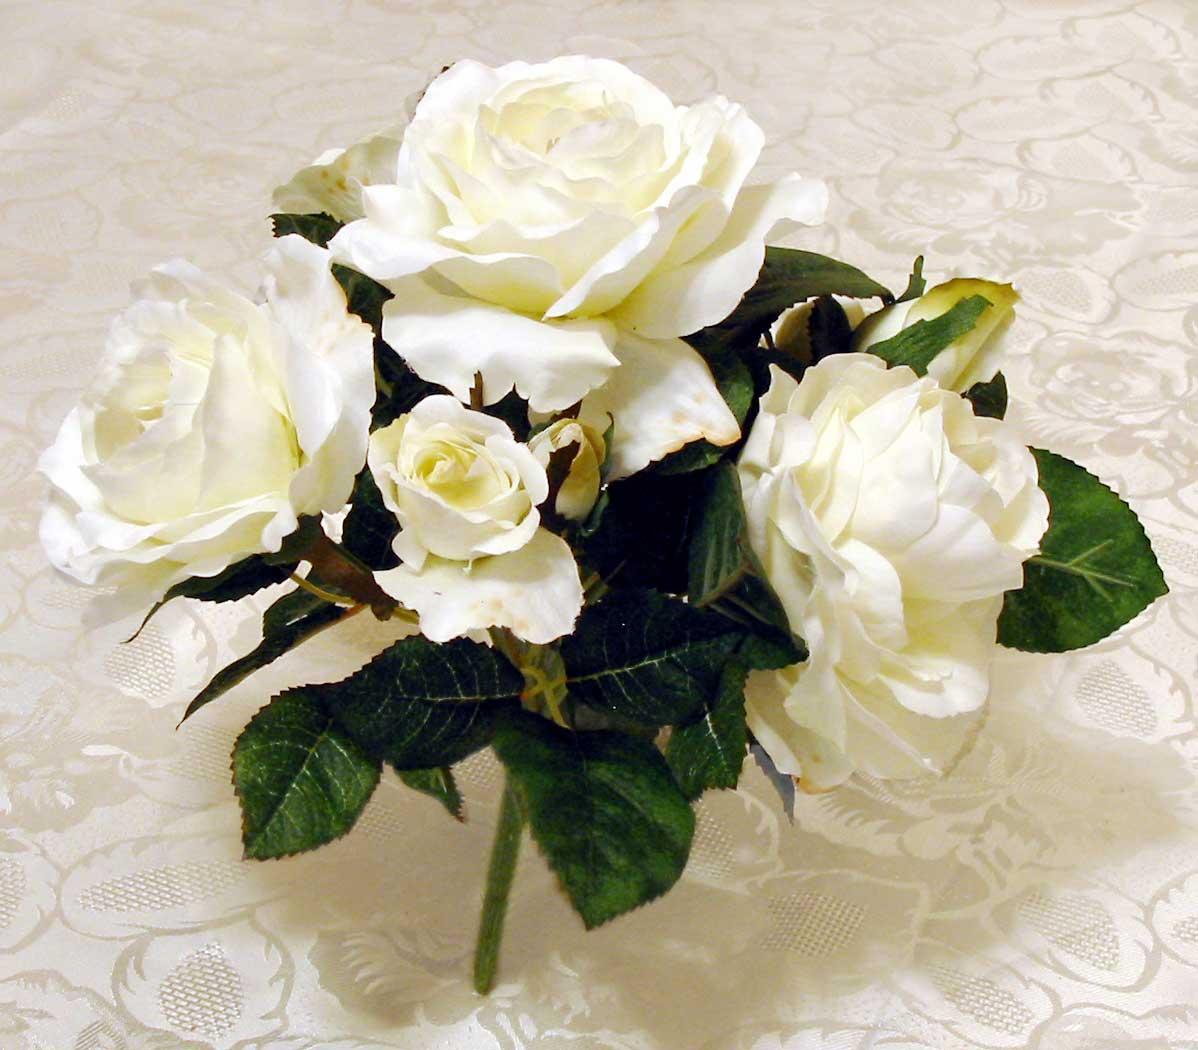 white rose flowers - photo #5